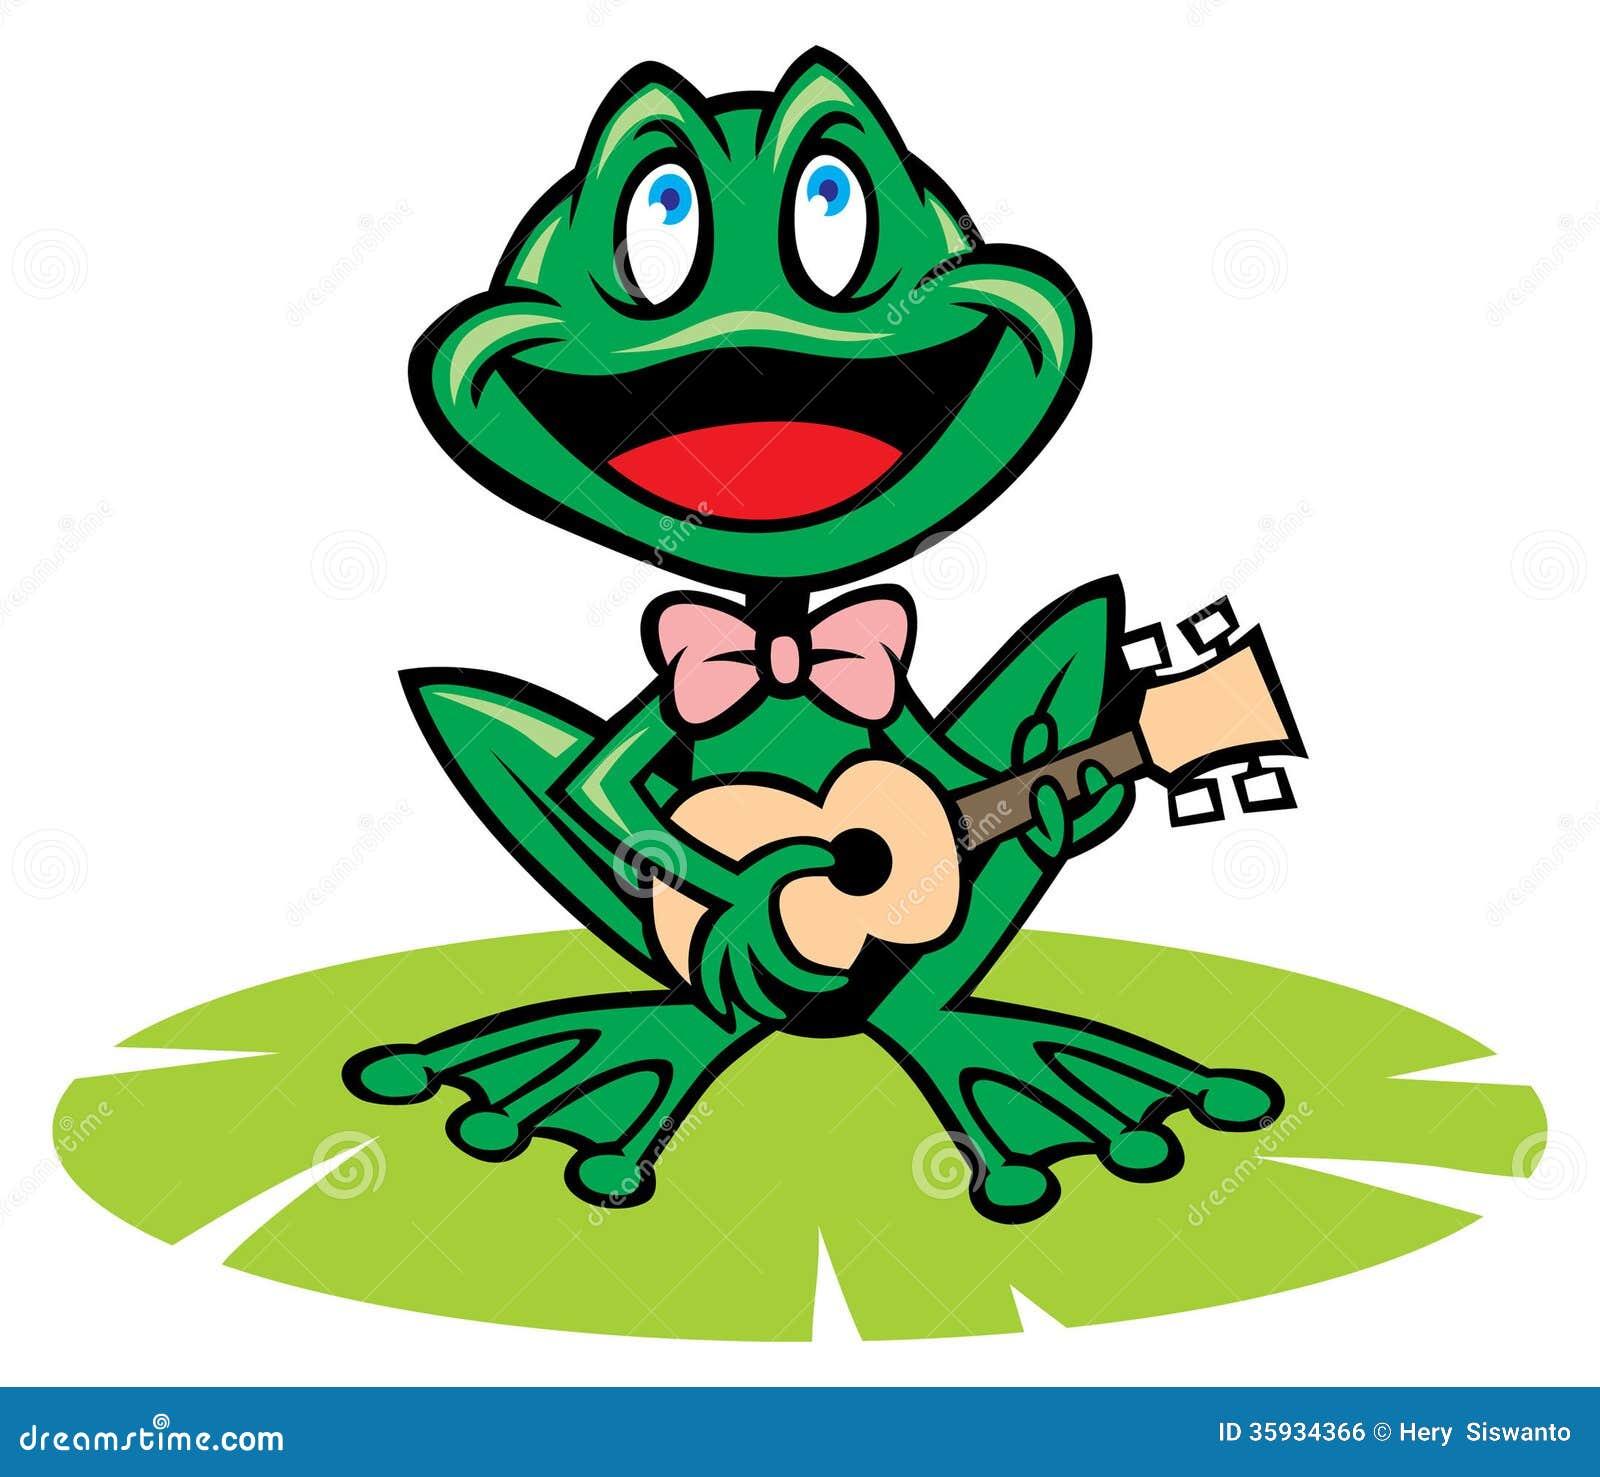 Singing Frog Royalty Free Stock Image - Image: 35934366